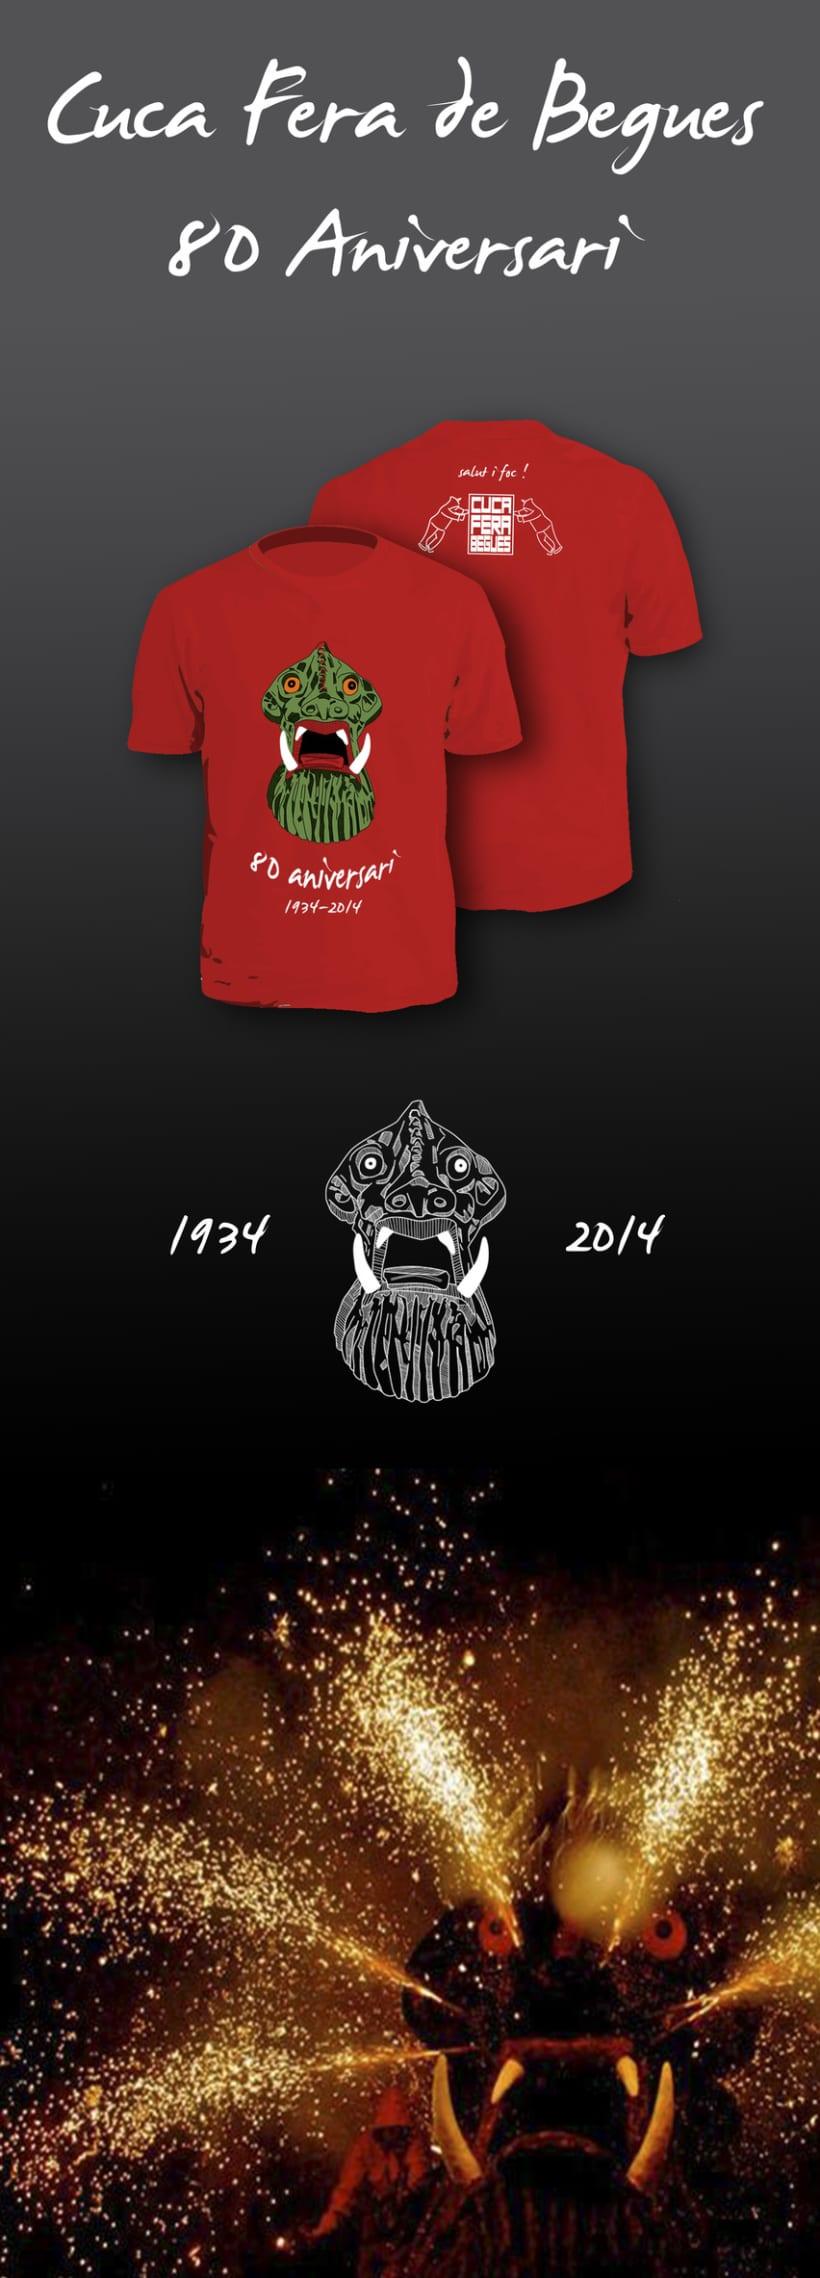 Cuca Fera de Begues 2014 - 80 Aniversario 0